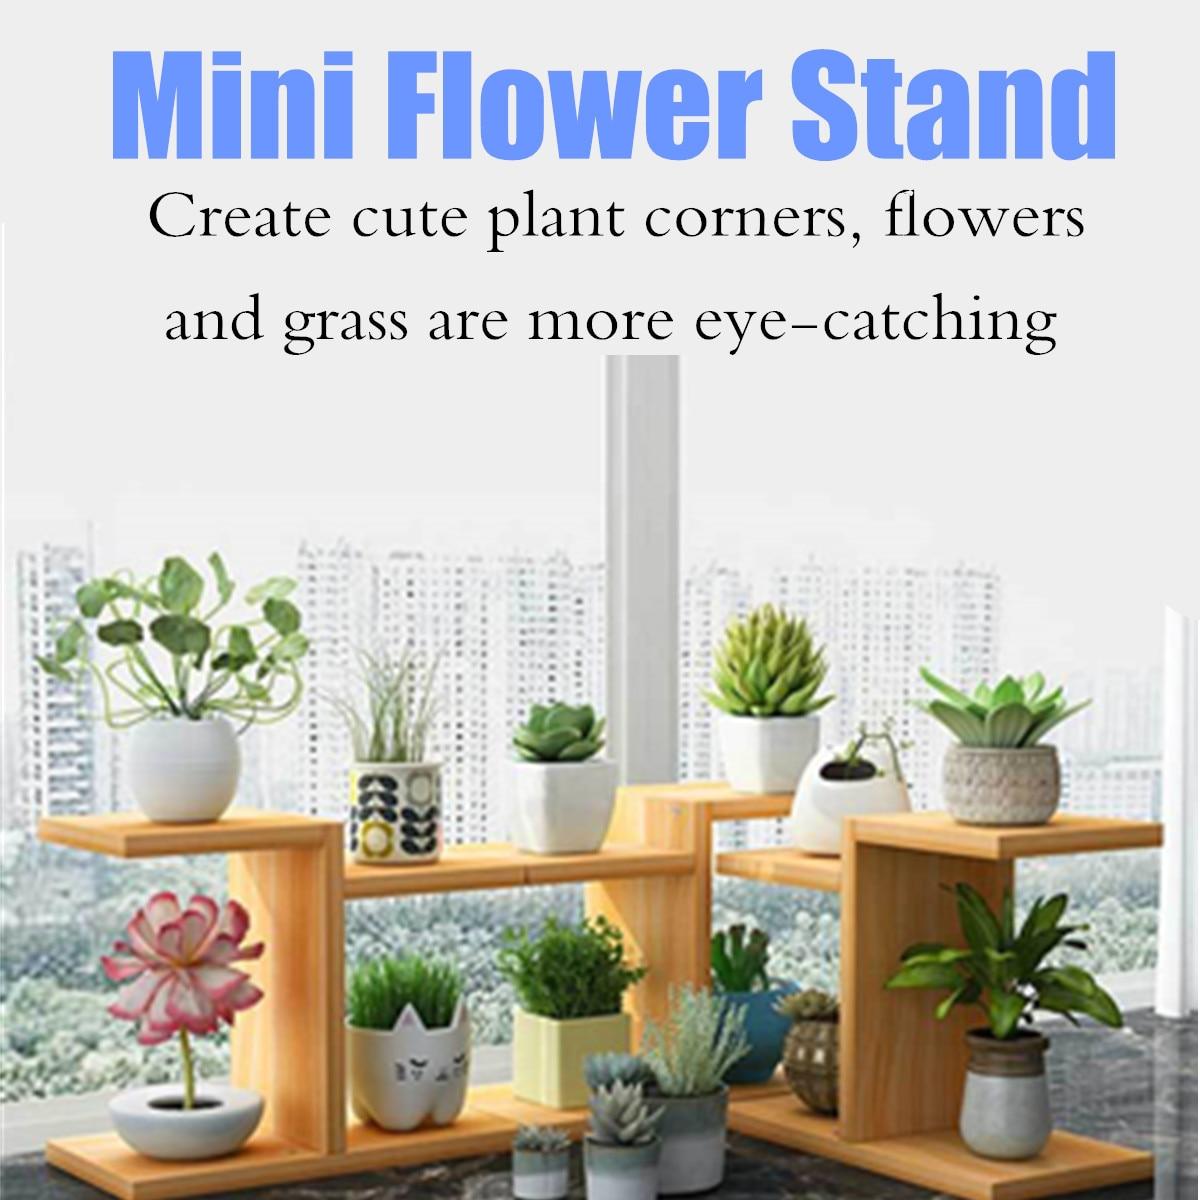 Simple Mini Wooden Plant Shelves Desktop Flower Rack Stand Flower Display Stand Storage Shelf Organizer Home Desk Balcony Garden